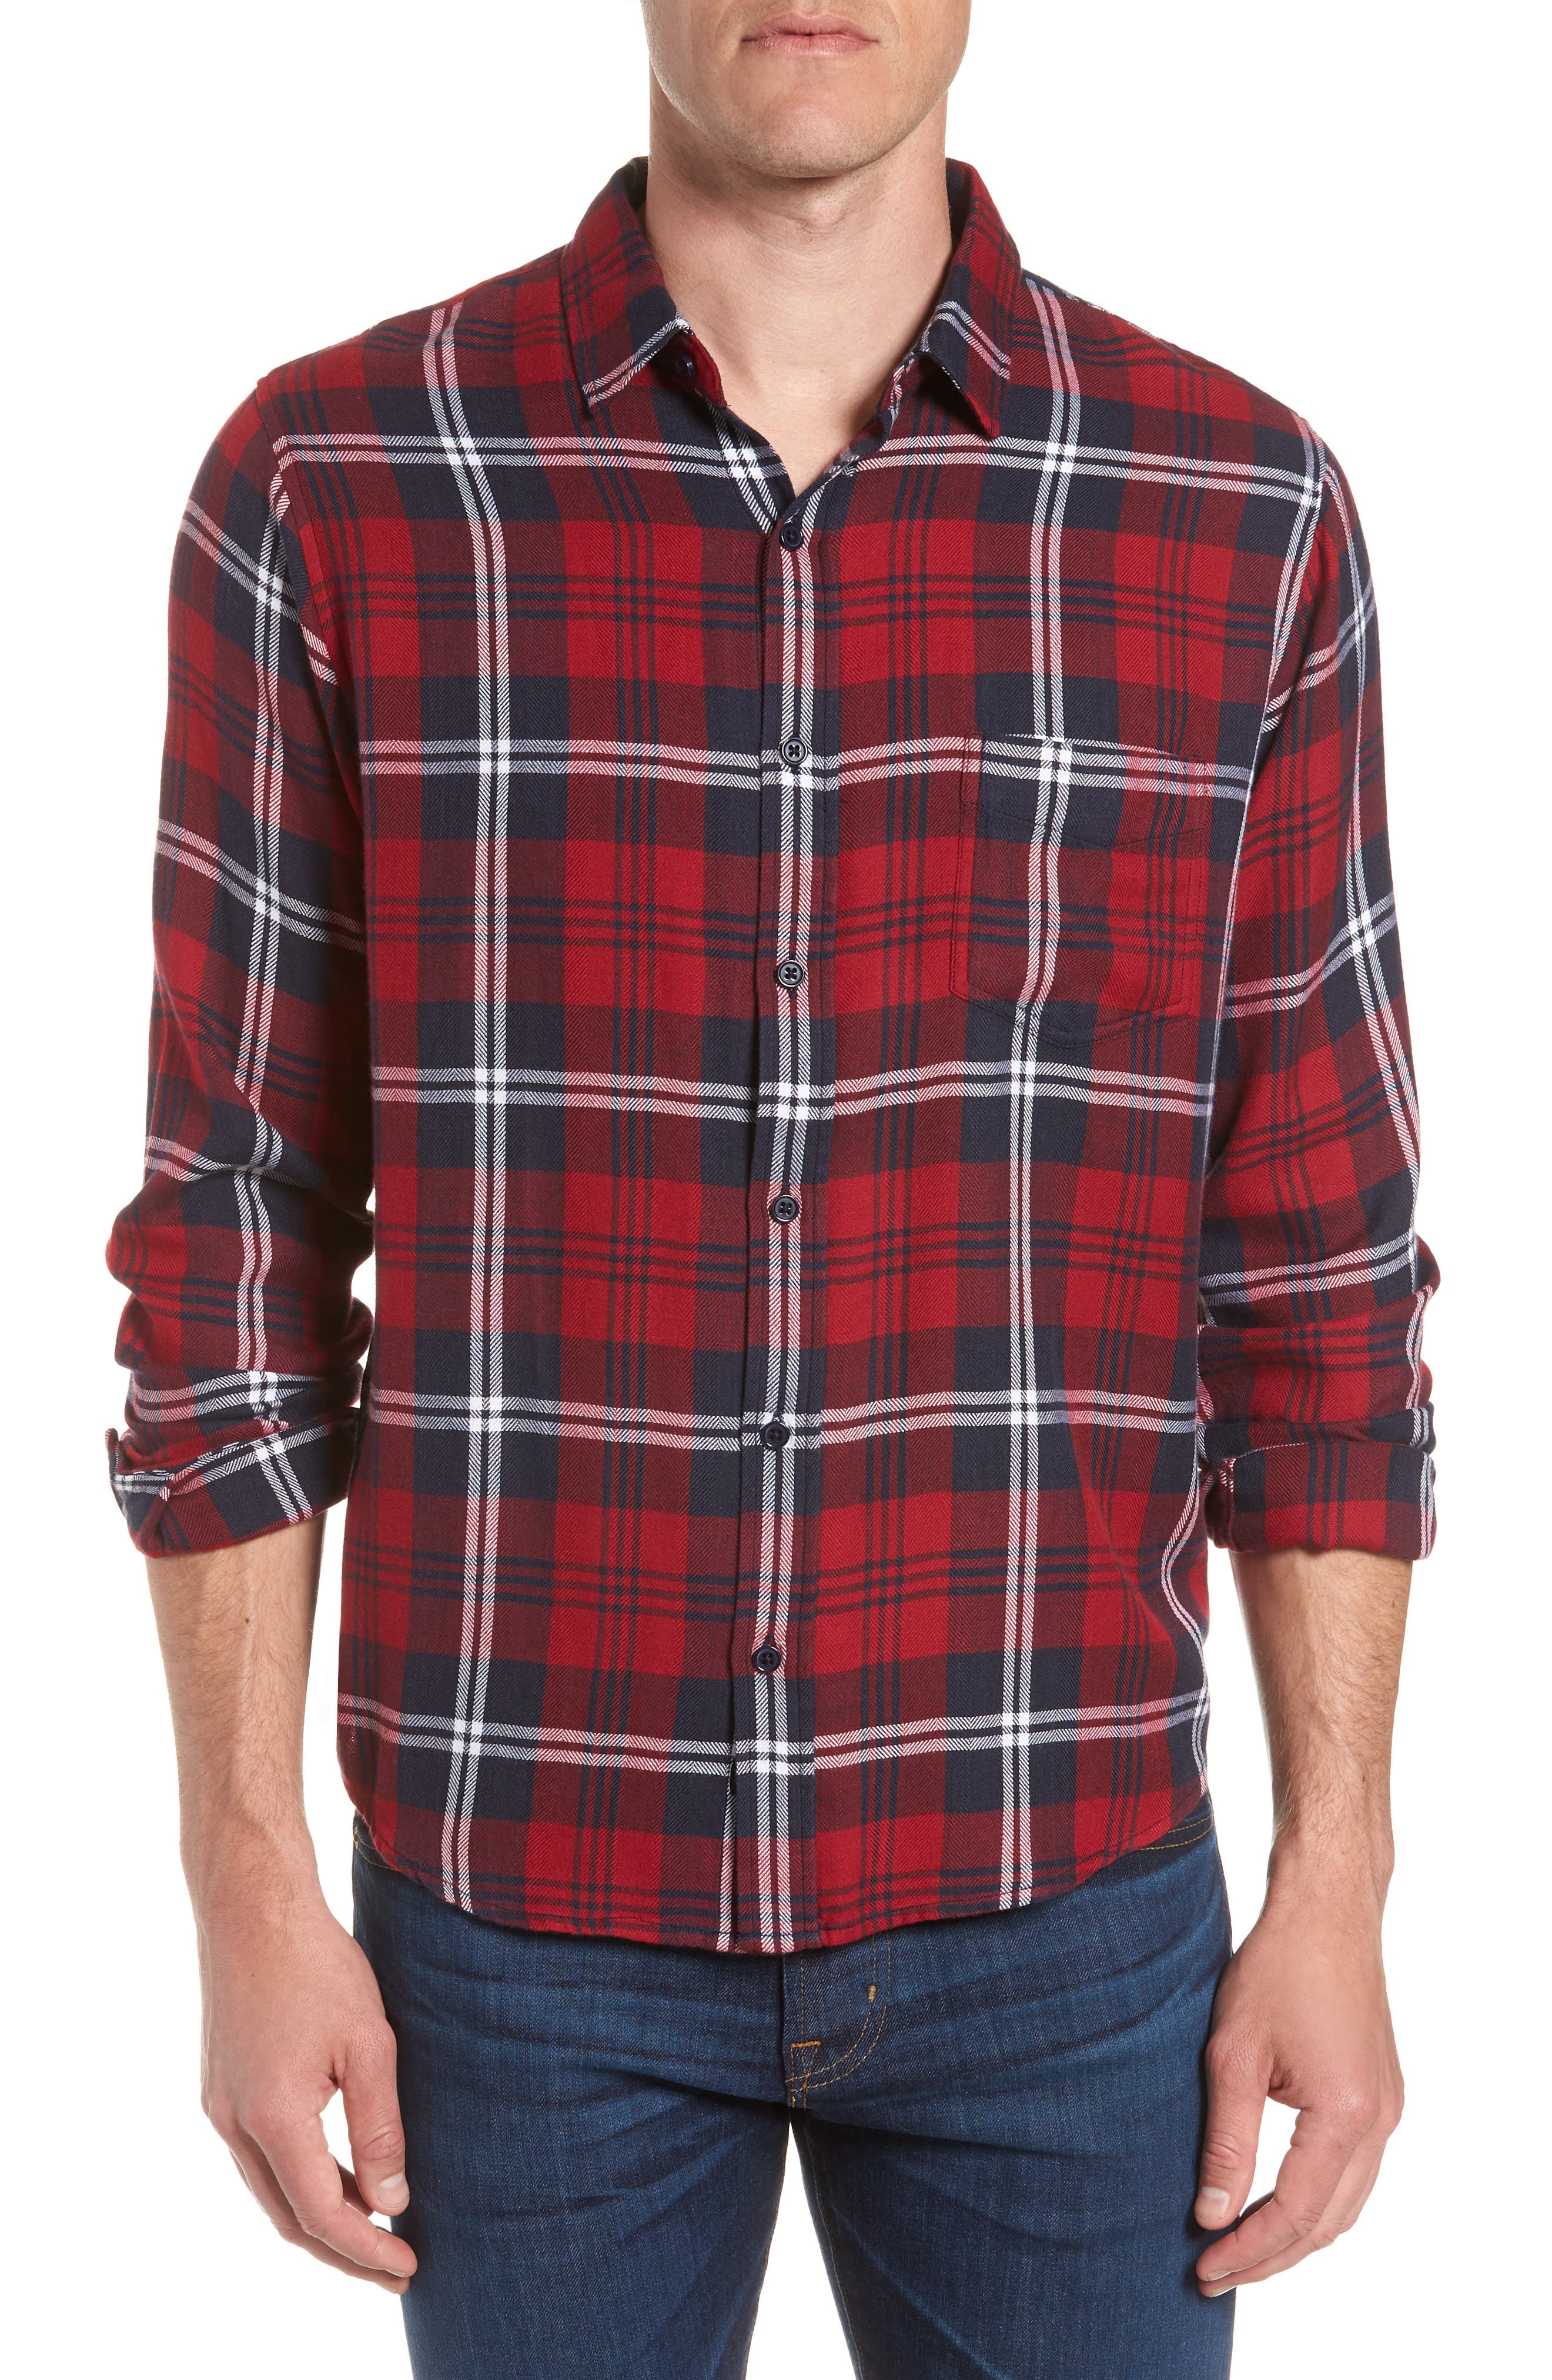 RAILS Lennox Sport Shirt, Main, color, RED/ NAVY/ WHITE